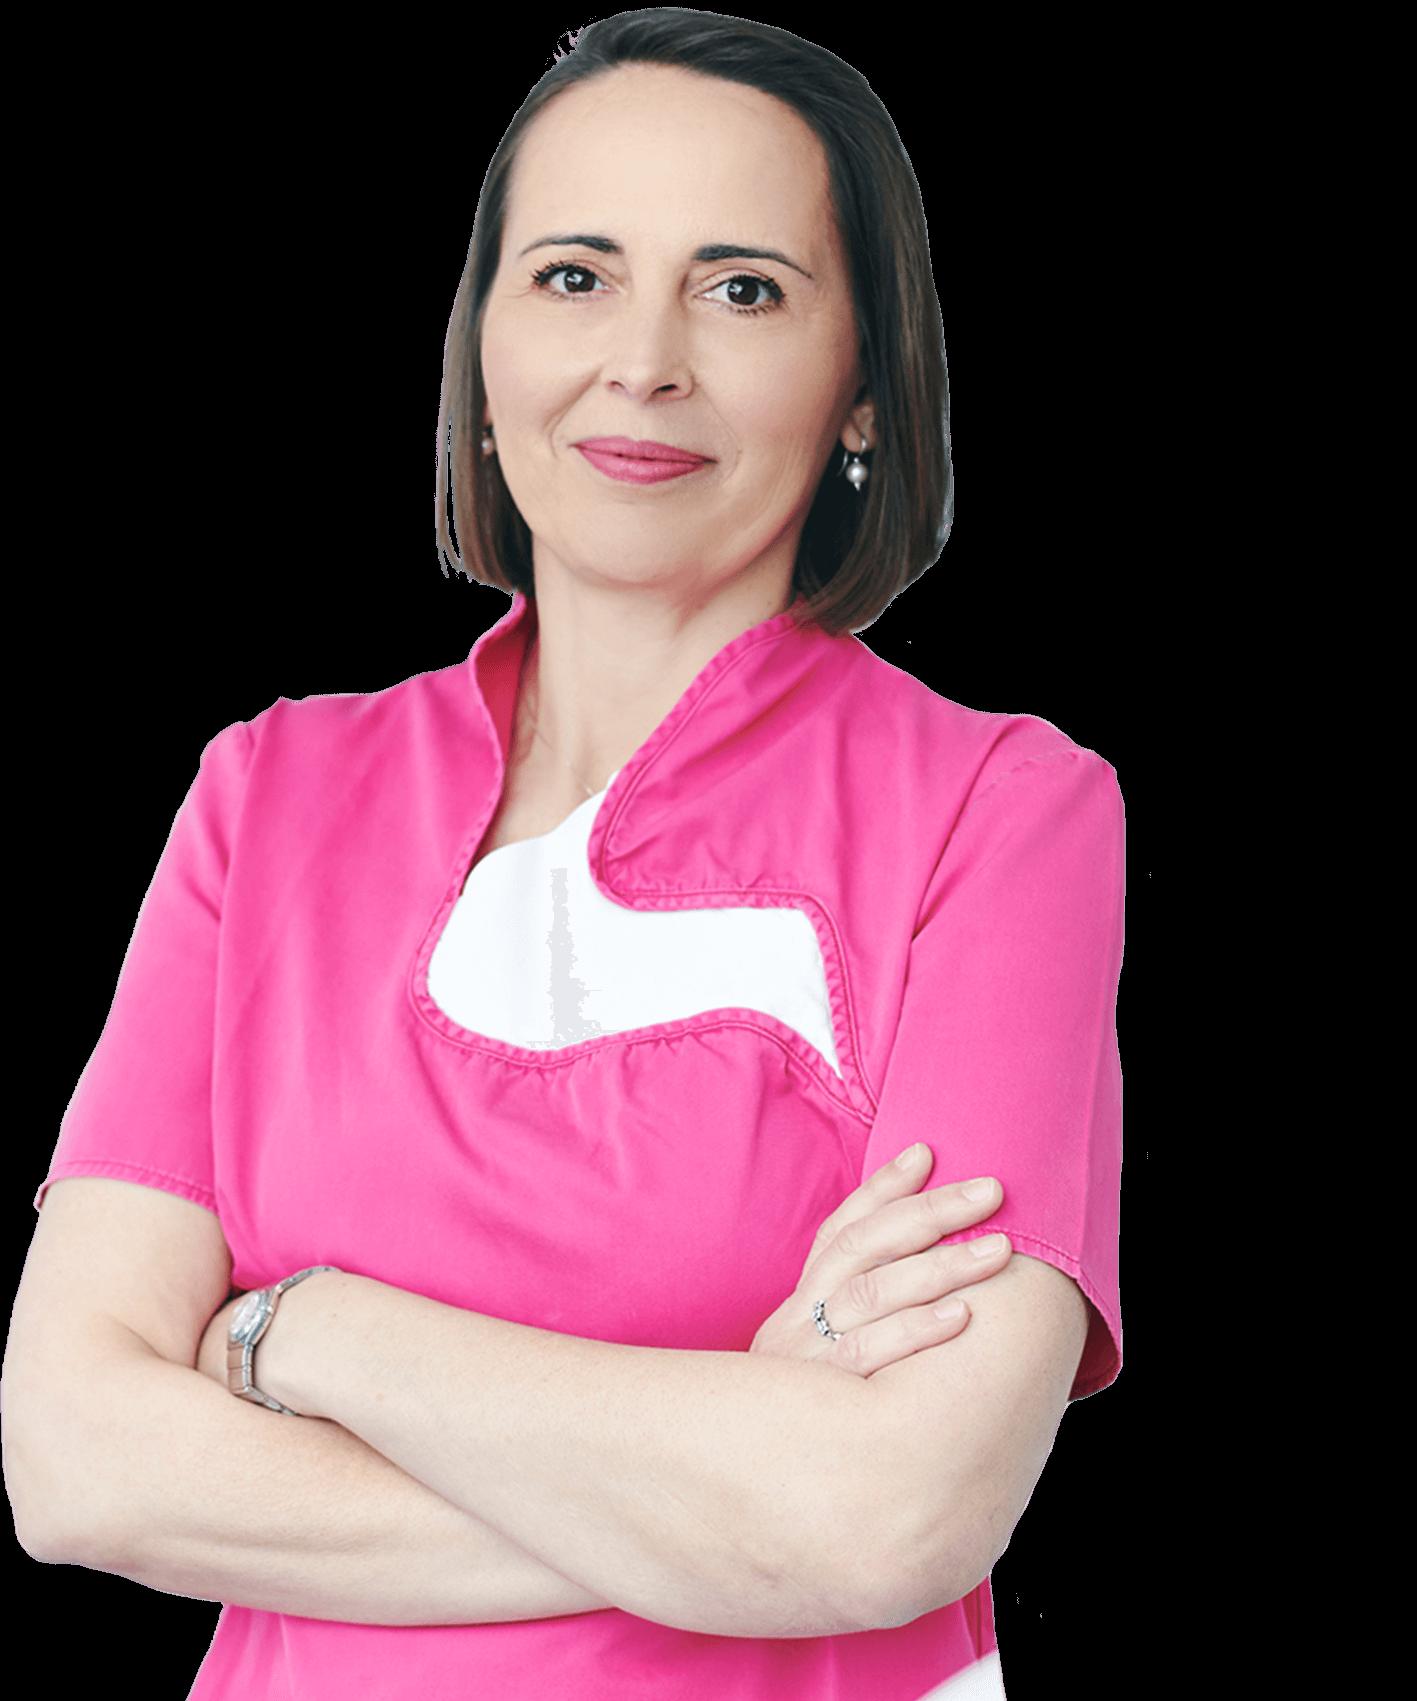 https://www.siljeg.hr/wp-content/uploads/2021/05/jelena-siljeg-stomatolog-ortodont.png